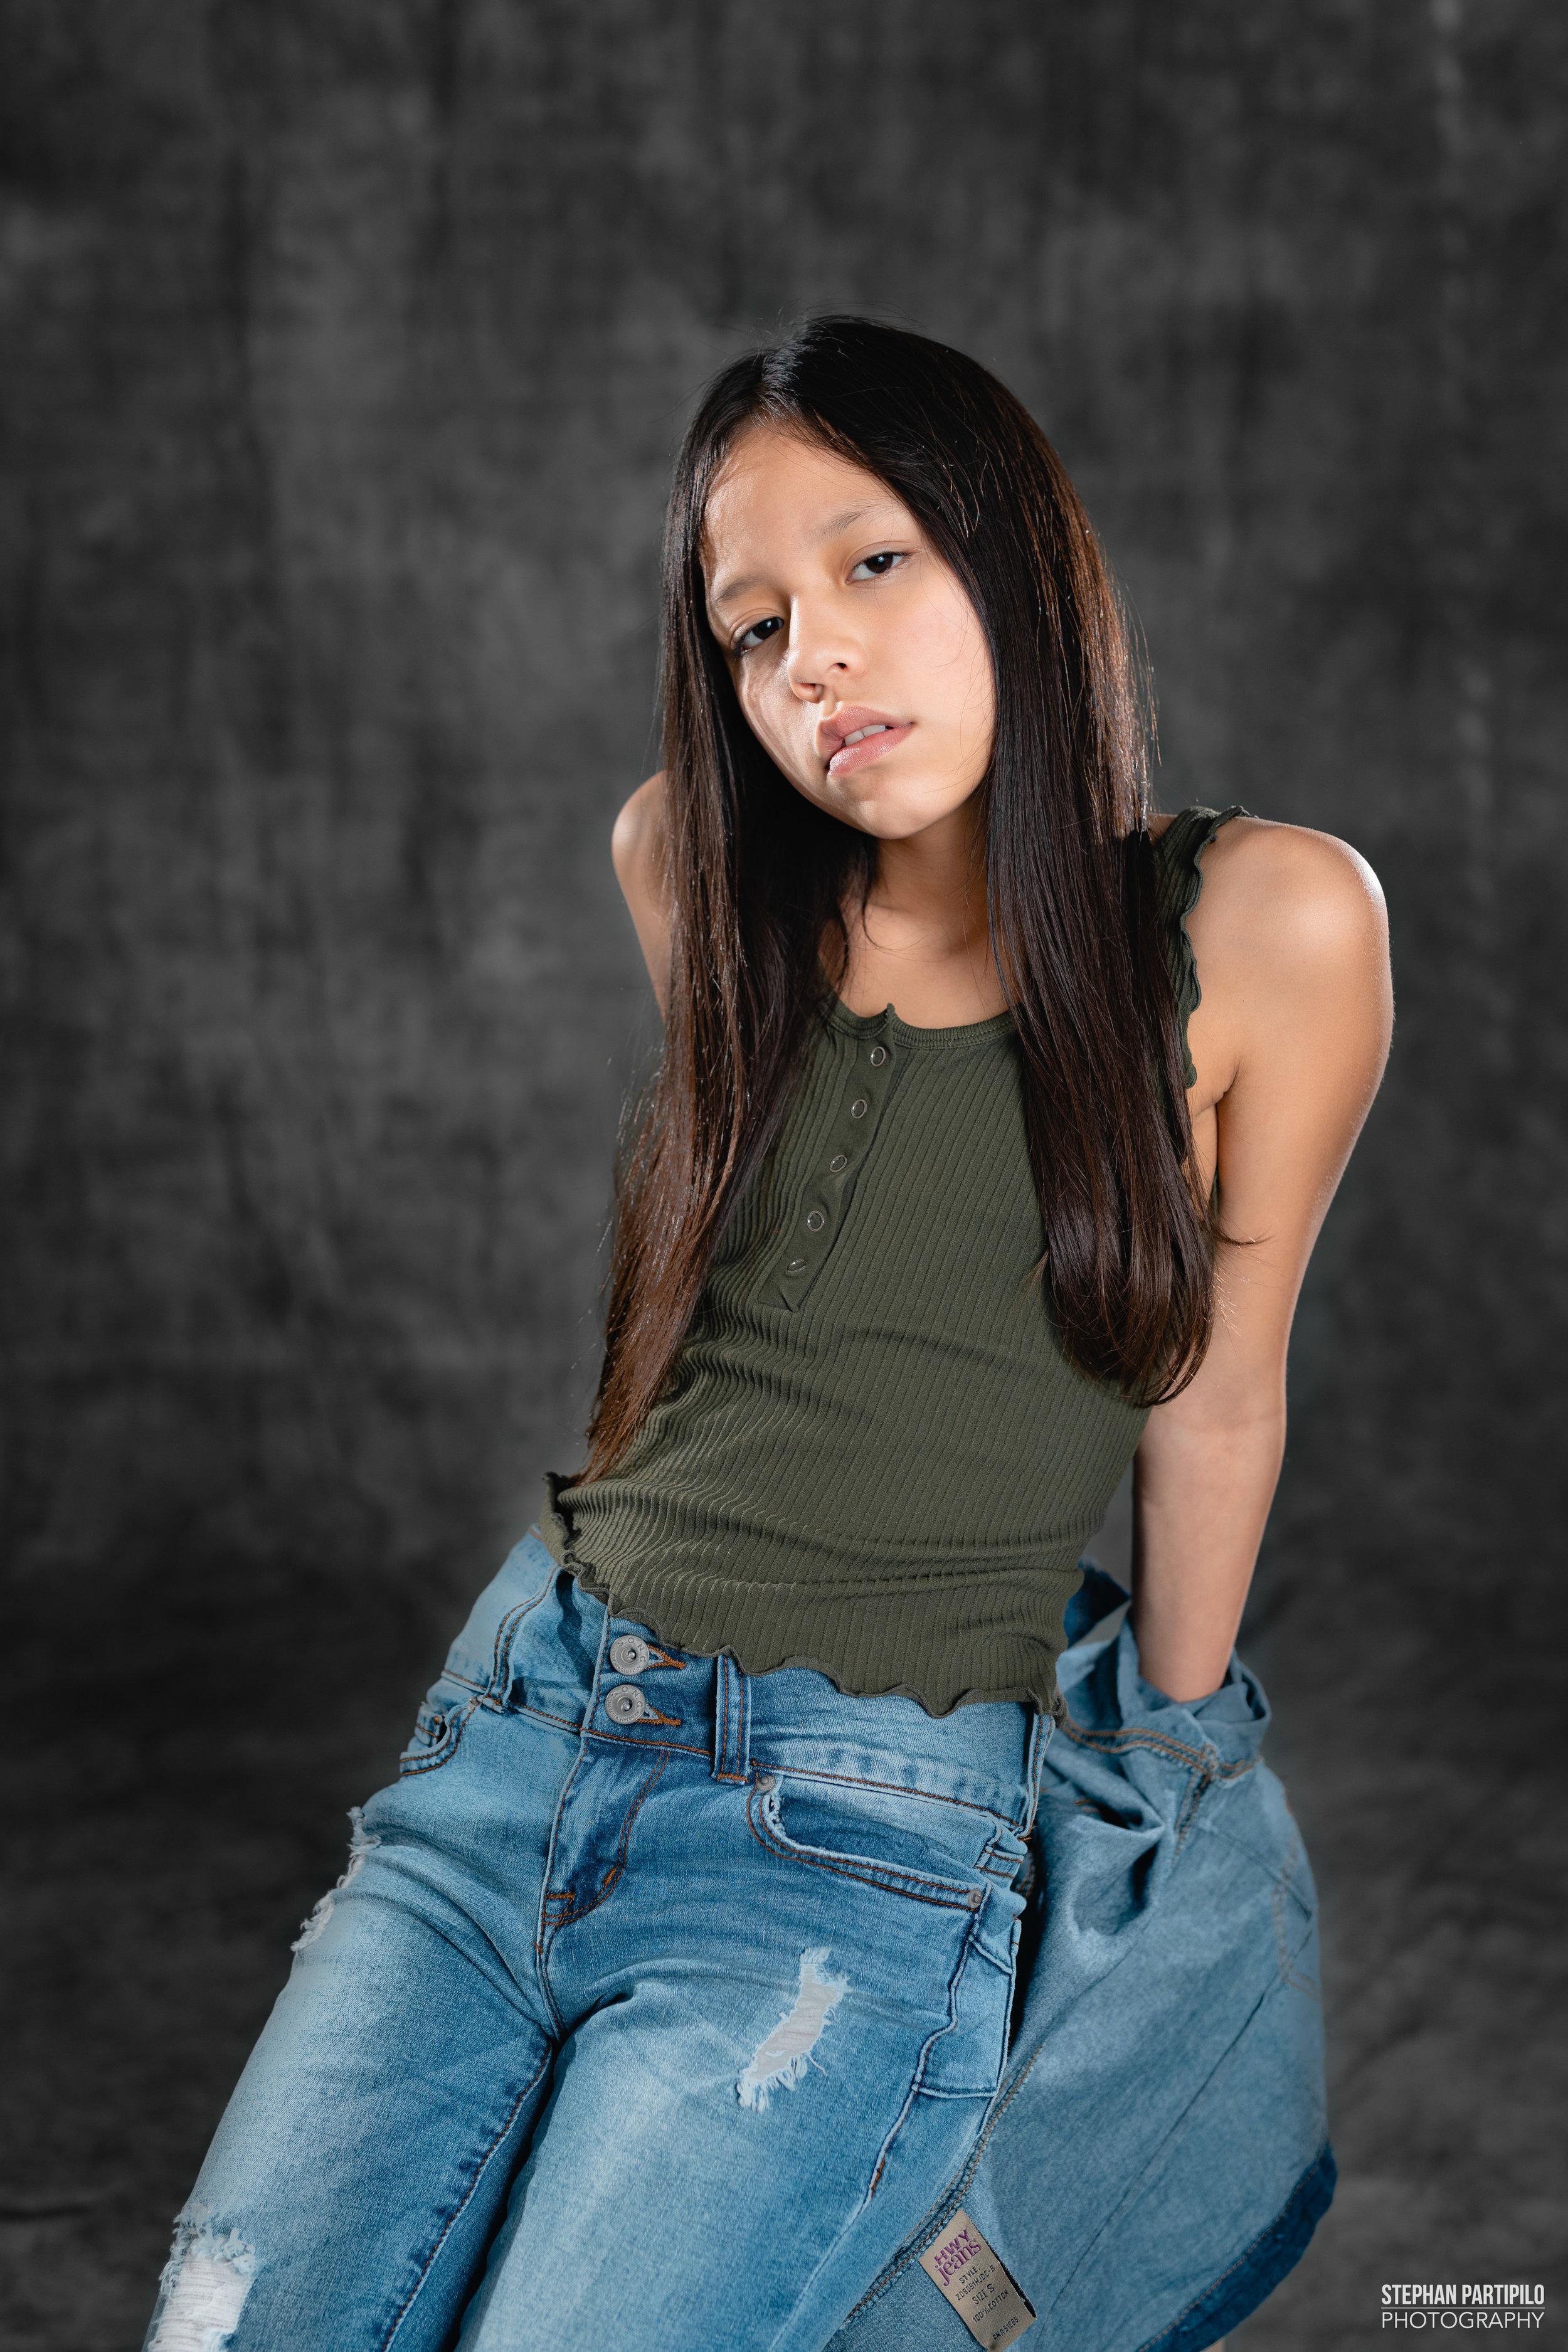 Marisol Child Model PDX 2019 0G5A9605.jpg